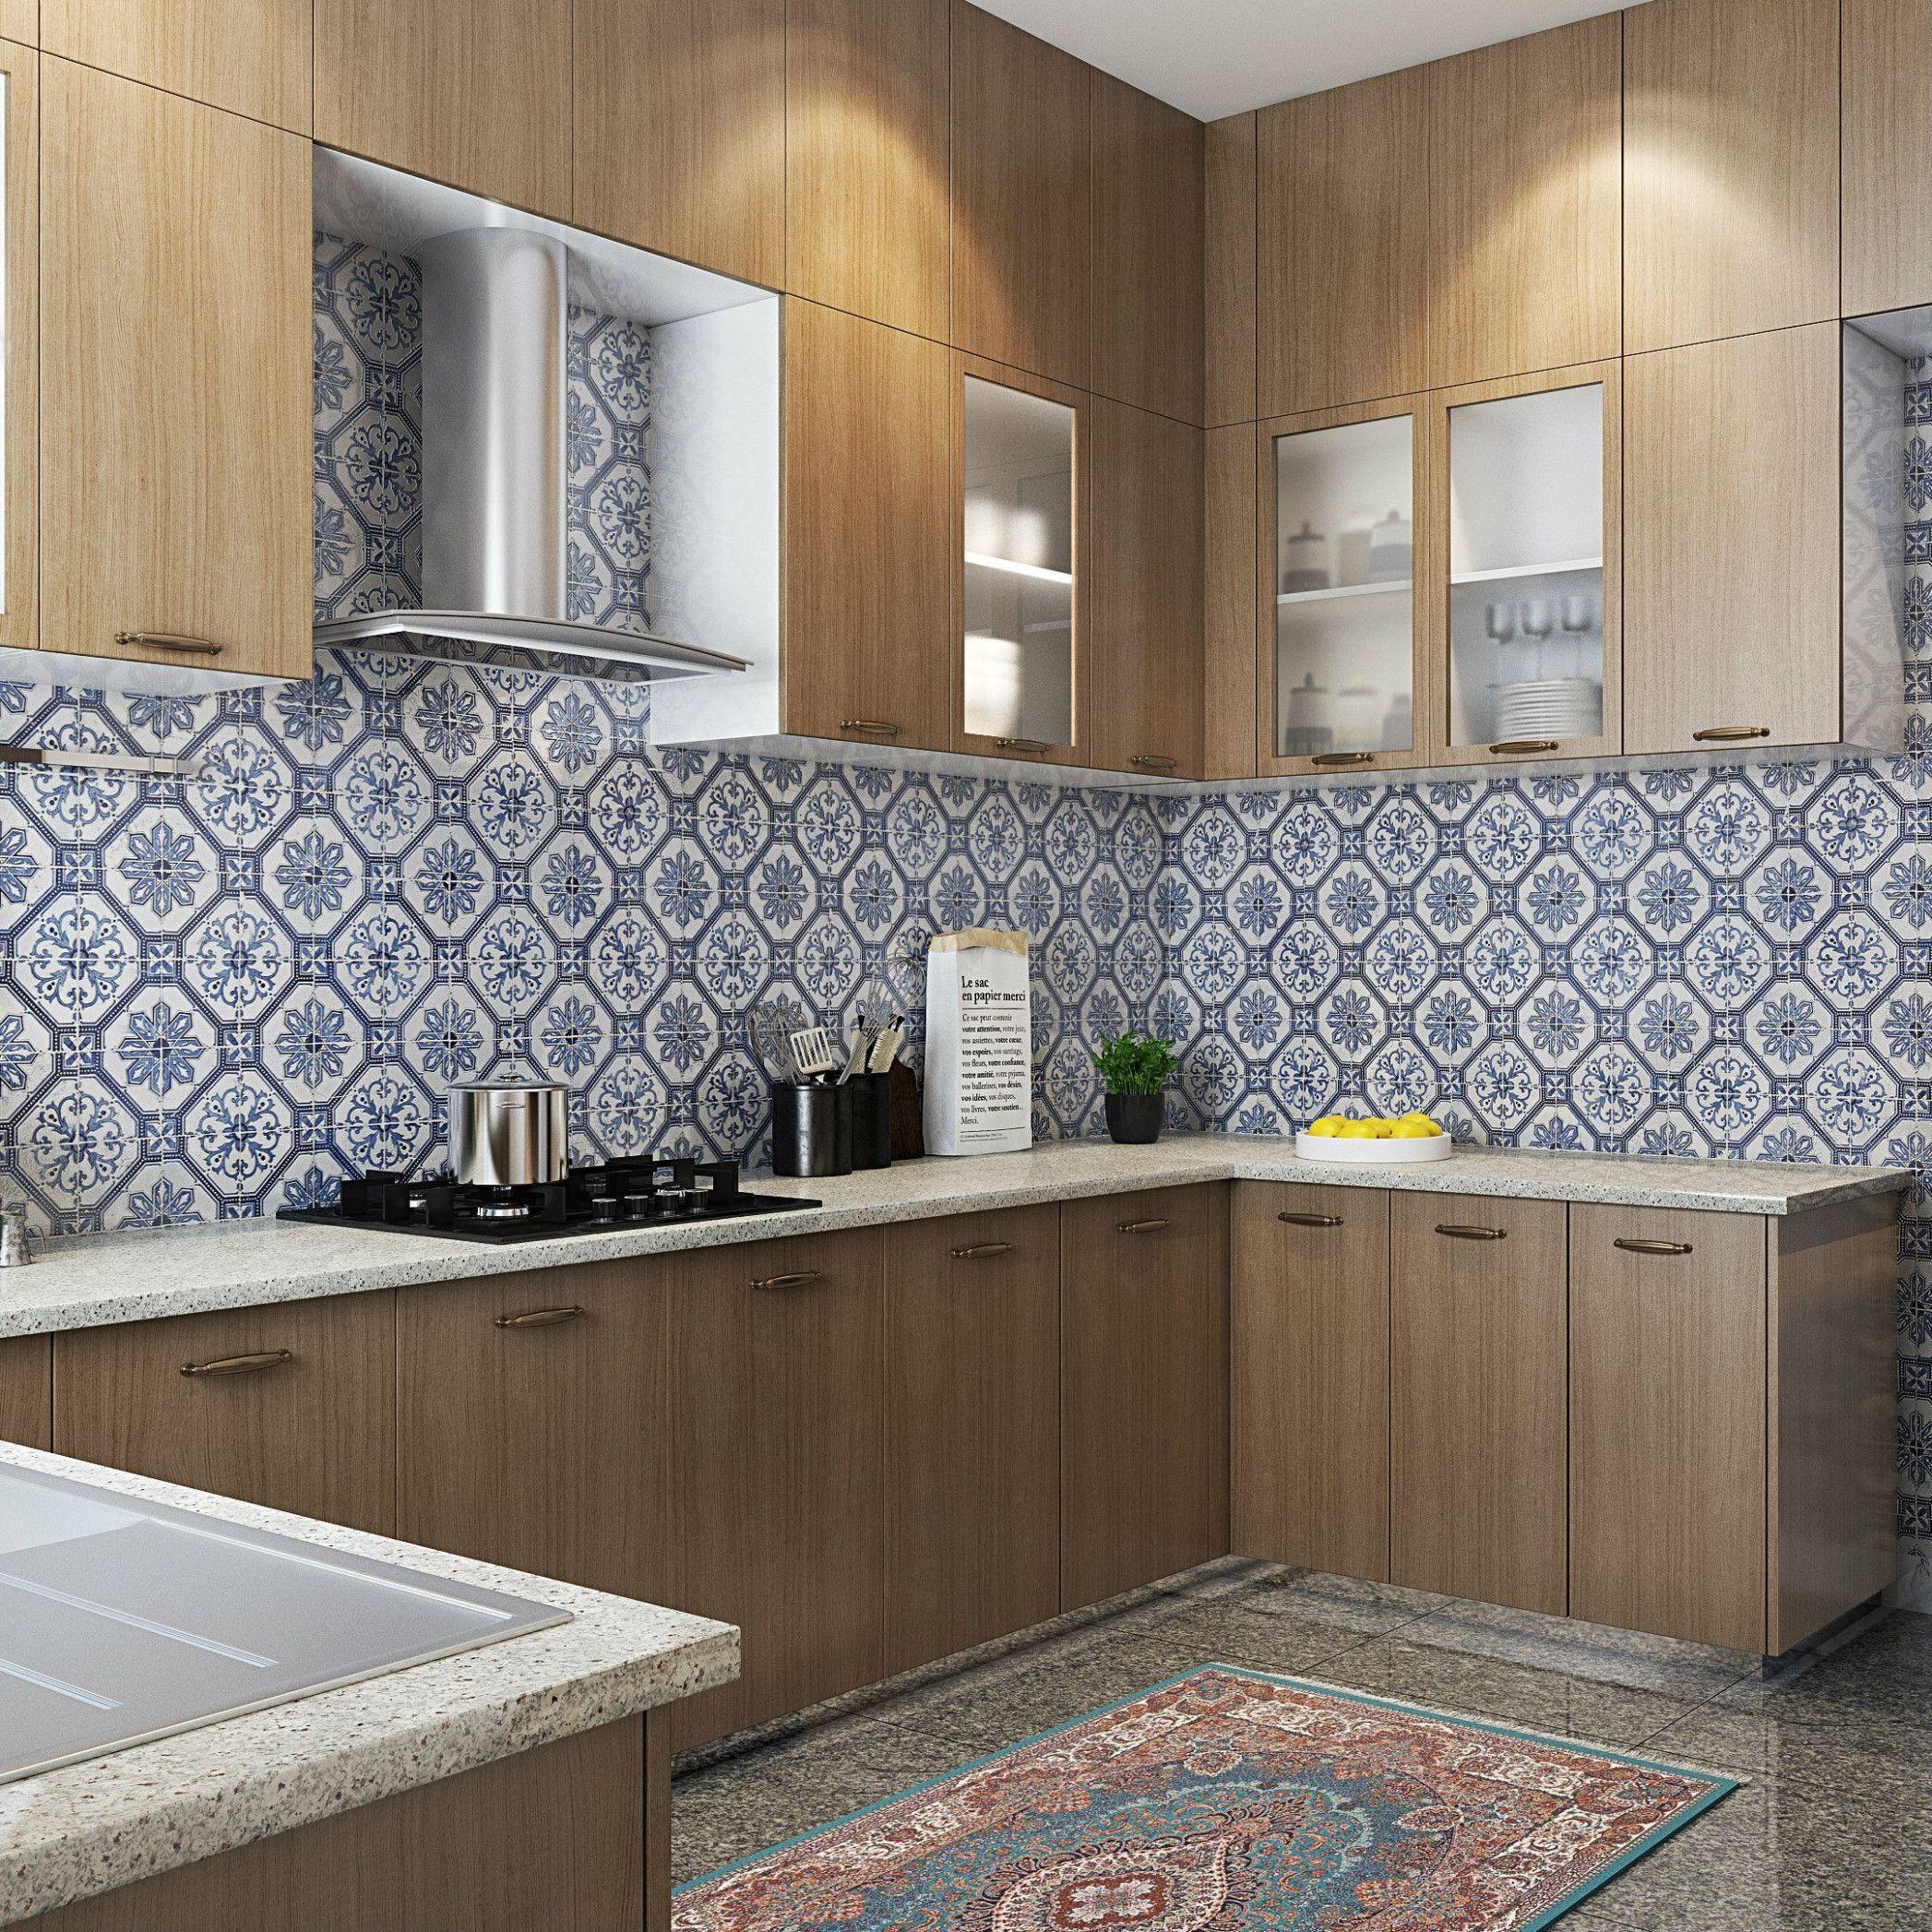 Modular Kitchen Wall Tiles Design Design Kitchen Wall Tiles